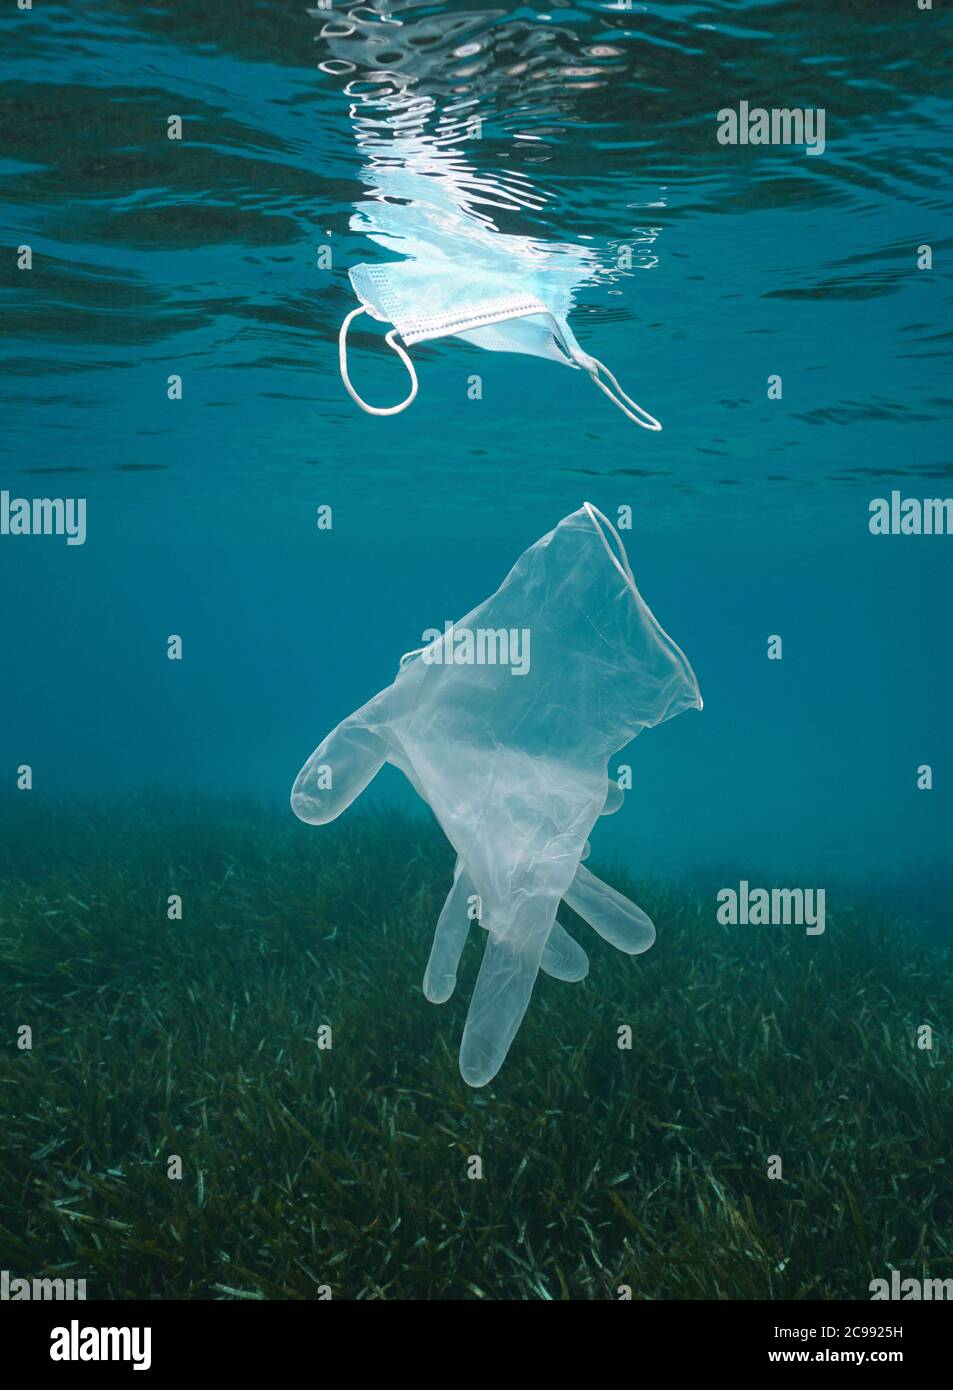 Plastic waste pollution underwater in the sea, glove and face mask, coronavirus COVID-19 pandemic, Mediterranean sea Stock Photo